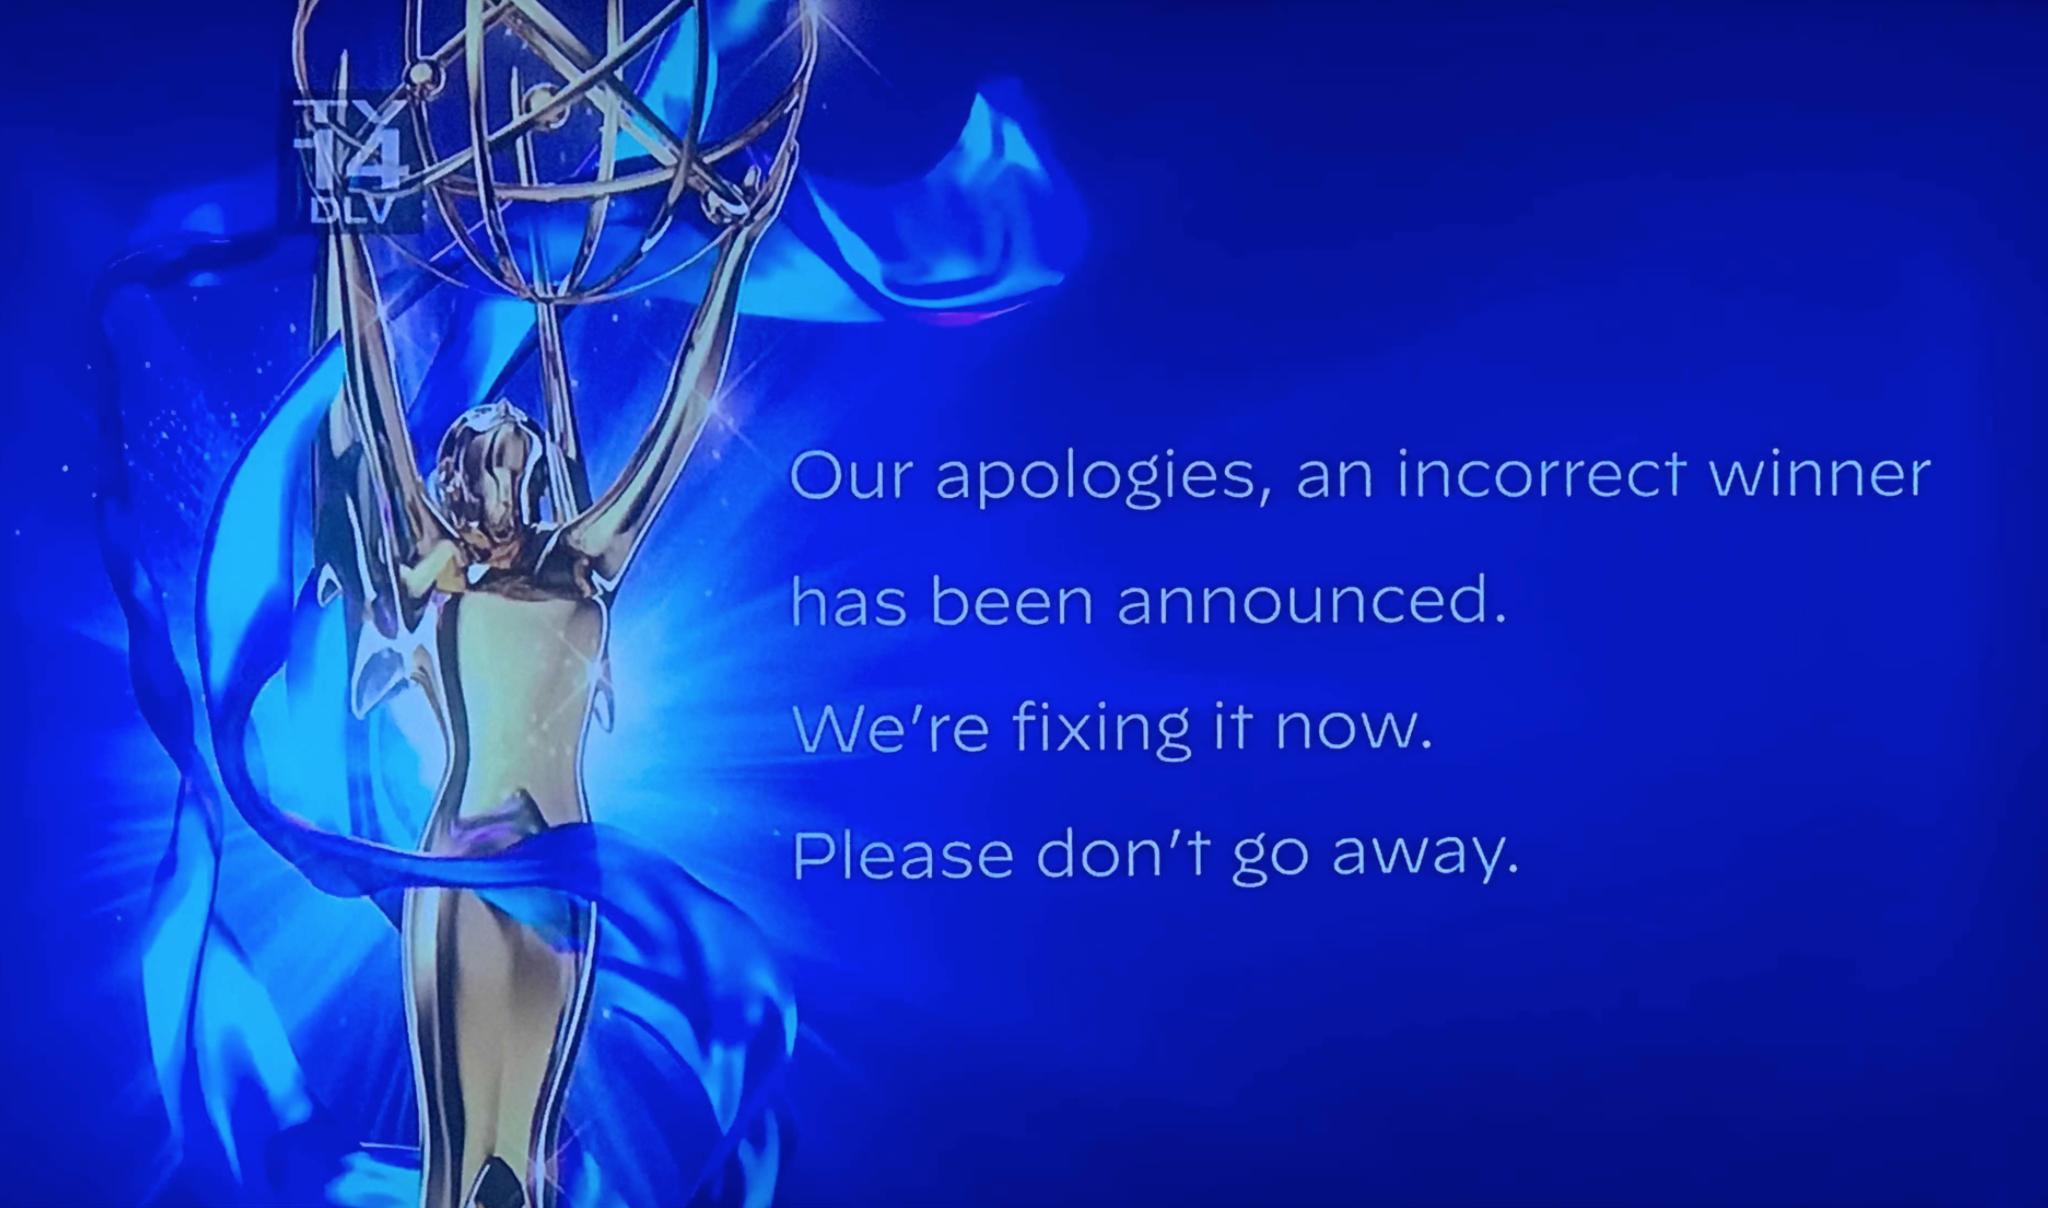 TV Academy mistakenly announces Jason Bateman as Emmy winner